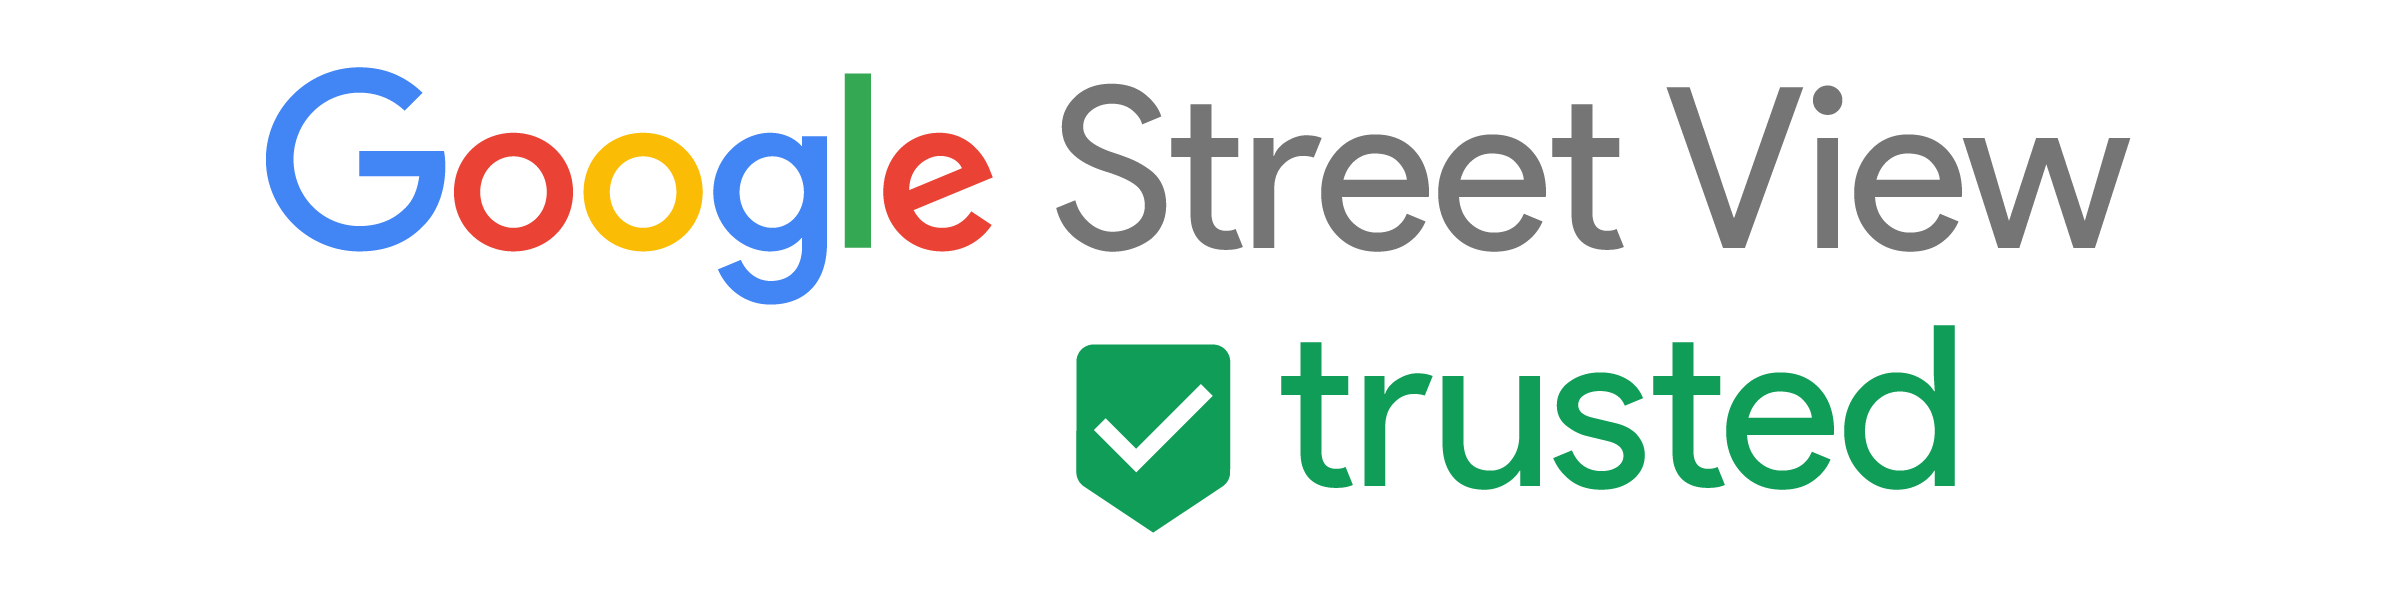 Google Virtual Tours,TrustedProBadge, Virtual Tours, Bevan Cockerill, Google Trusted, Gooogle Trusted Photographer